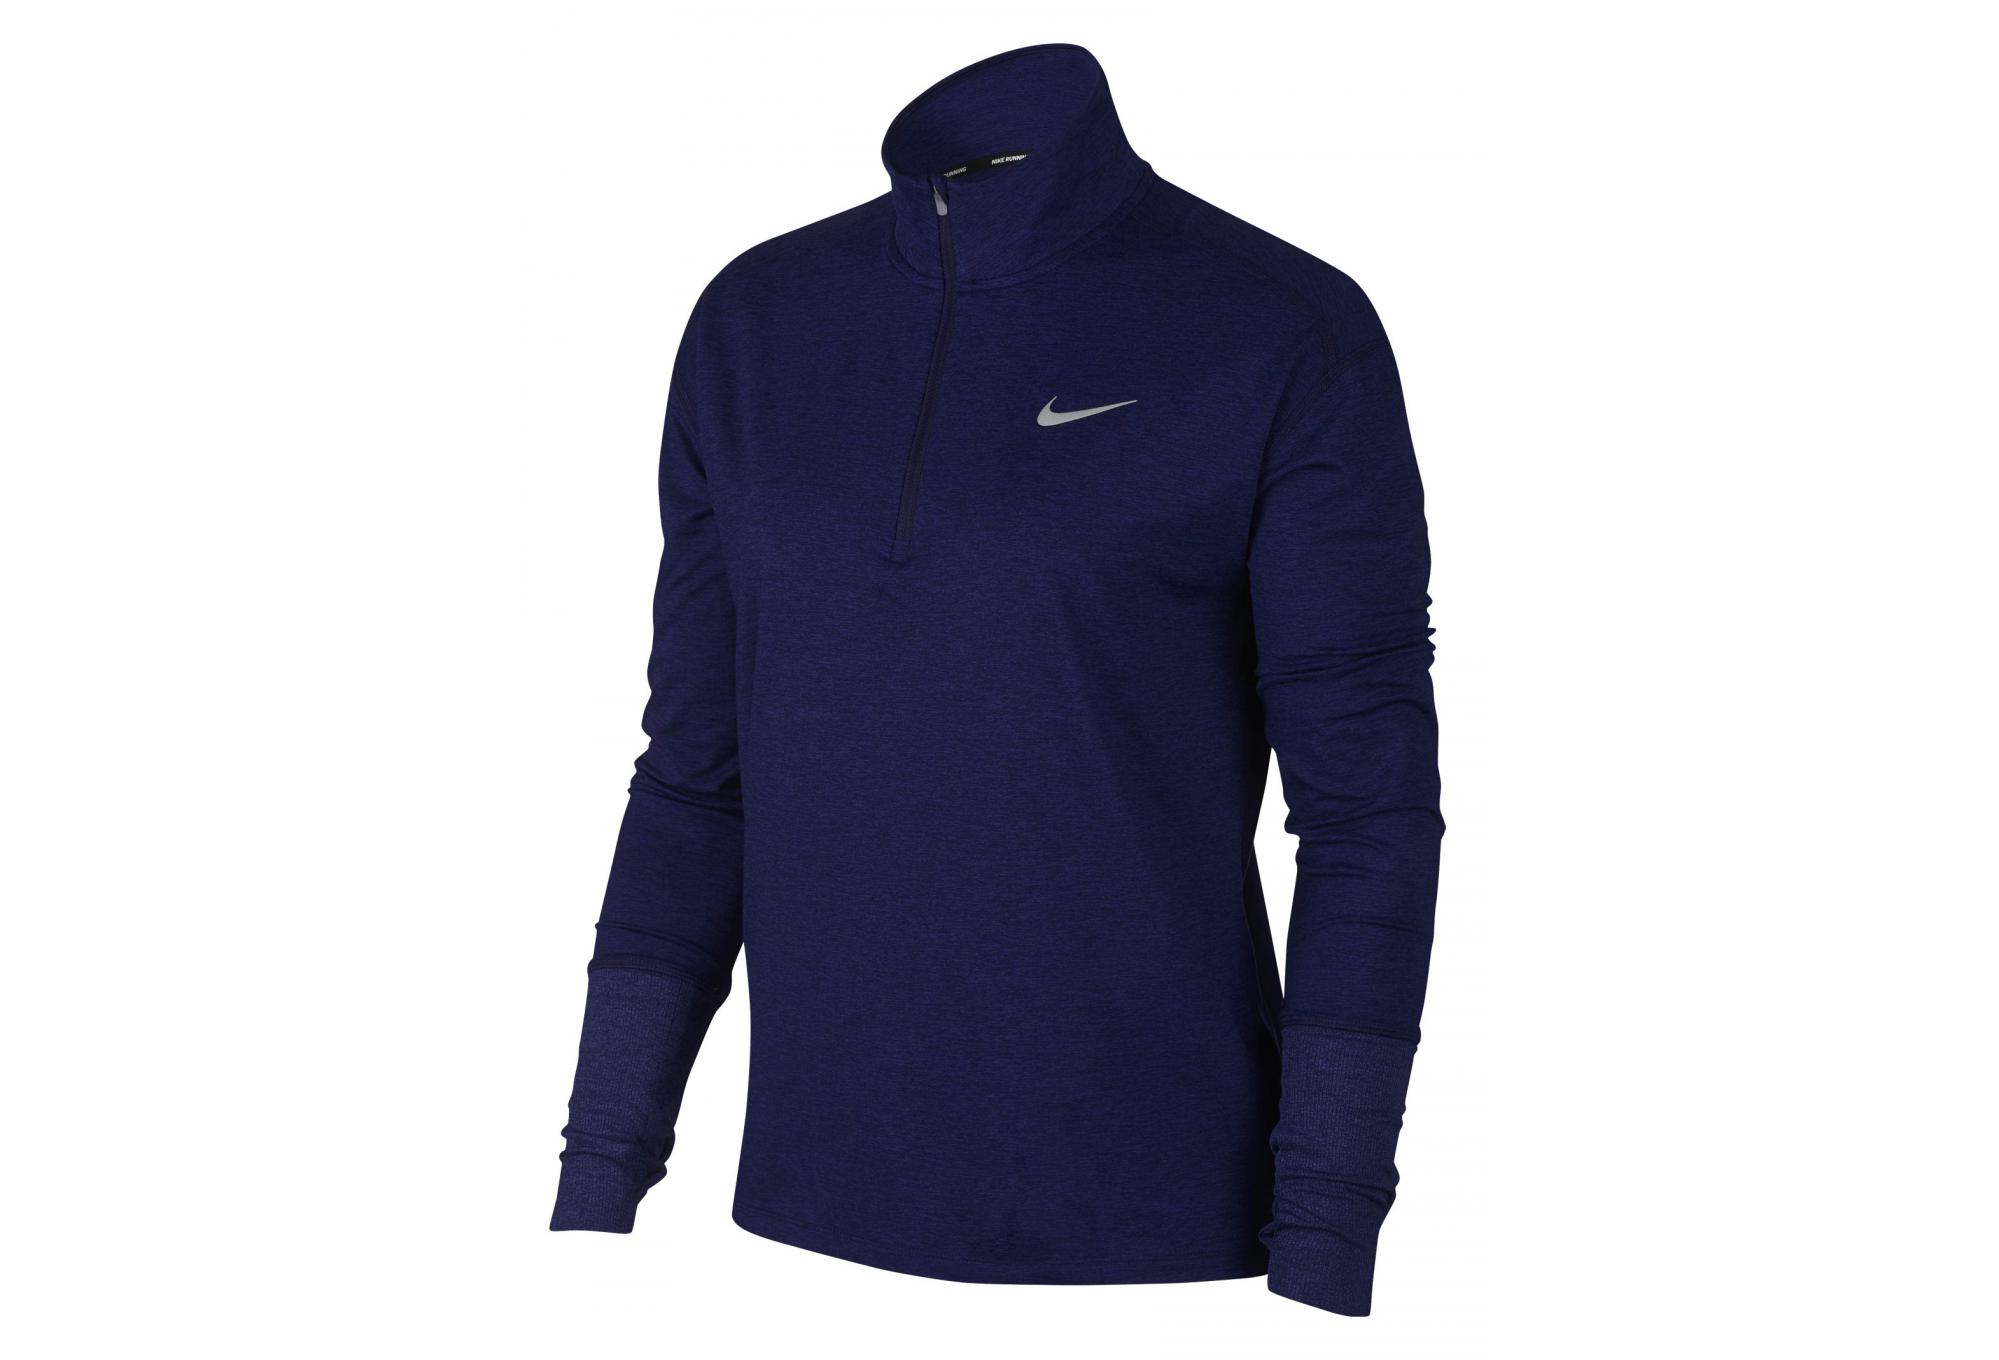 Pull Bleu Femme Nike 14 Zip Element IRFnIrg 3346c2895d9